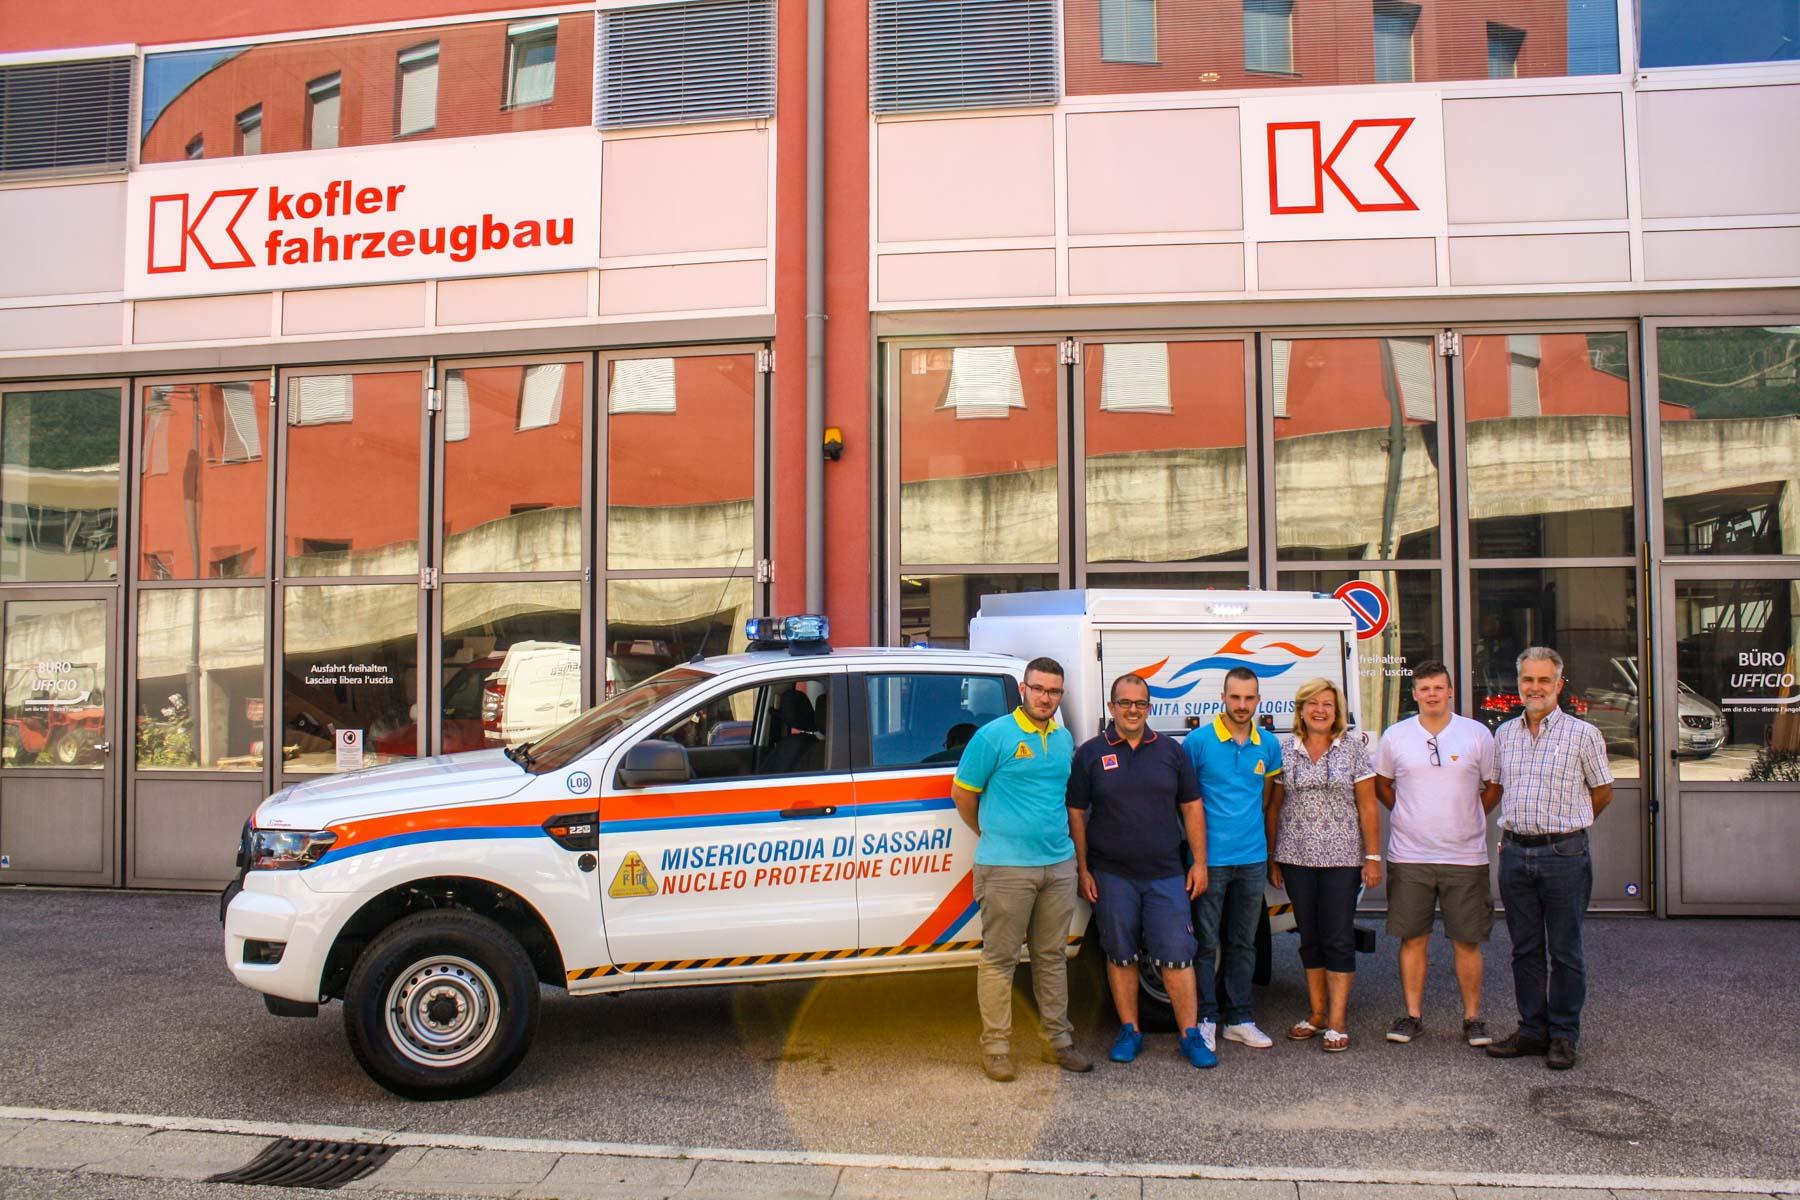 Übergabe-PC-Sassari-Kofler-Fahrzeugbau